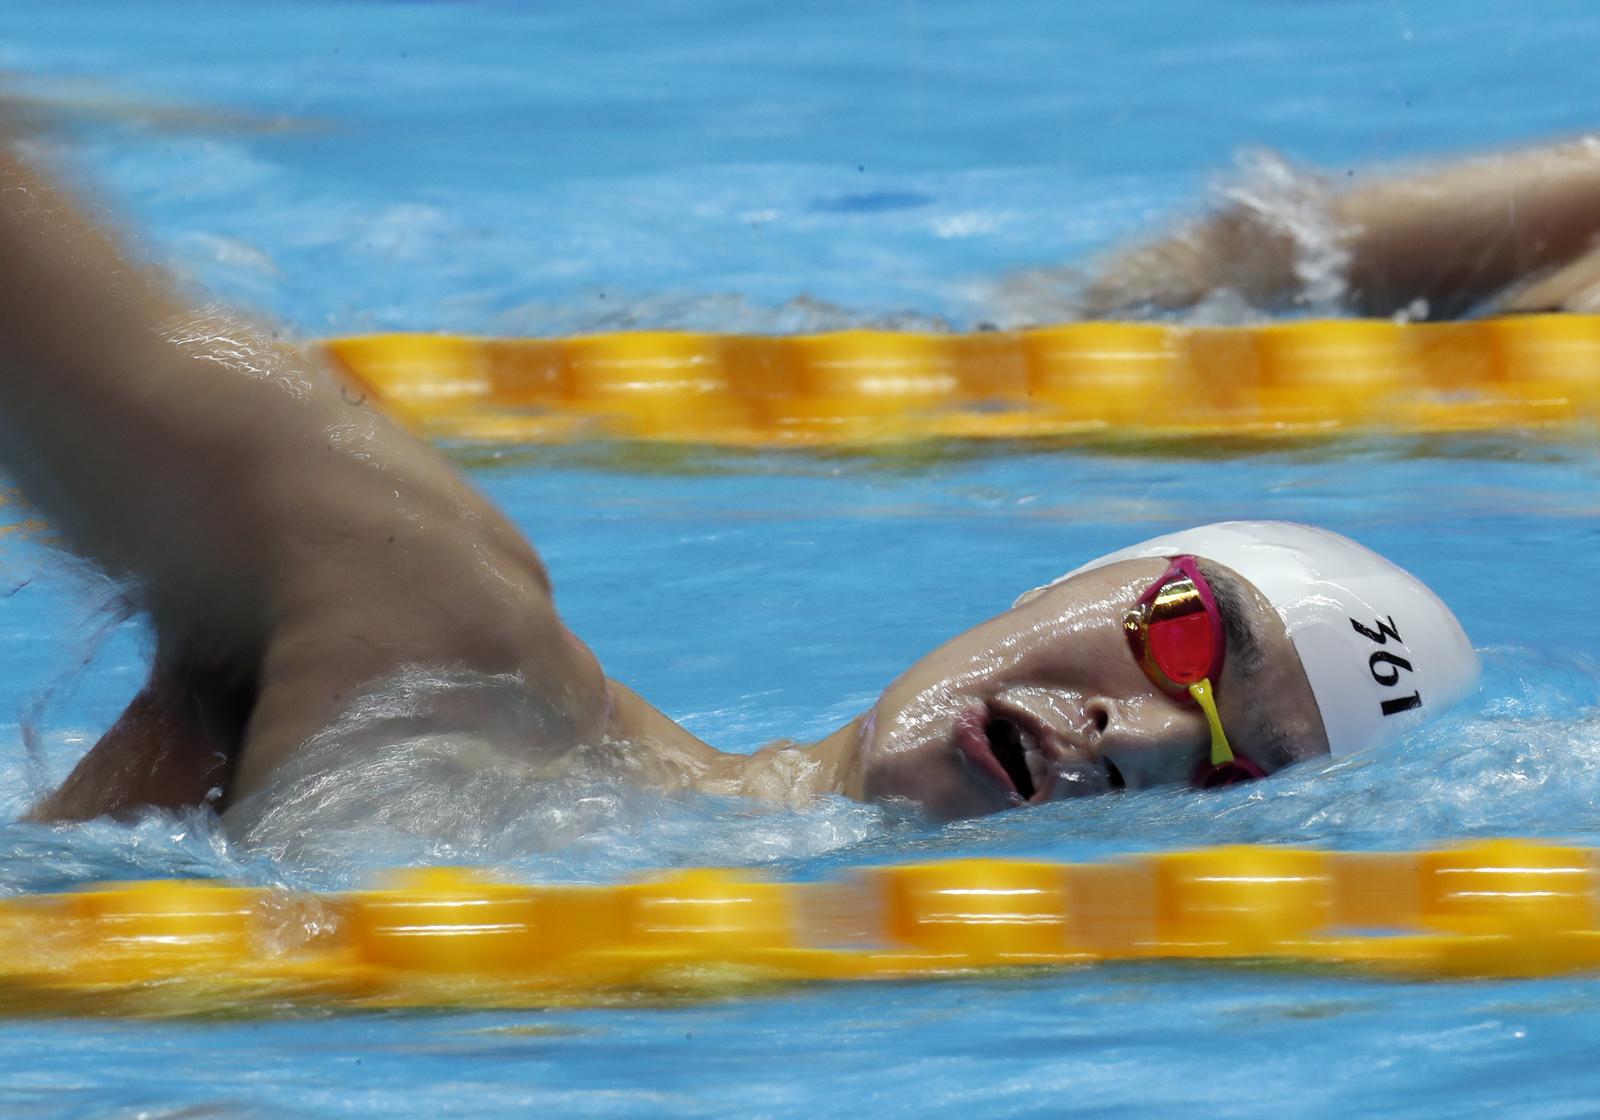 China's Sun Yang swims during a training session at the World Swimming Championships in Gwangju, South Korea, Saturday, July 20, 2019. AP